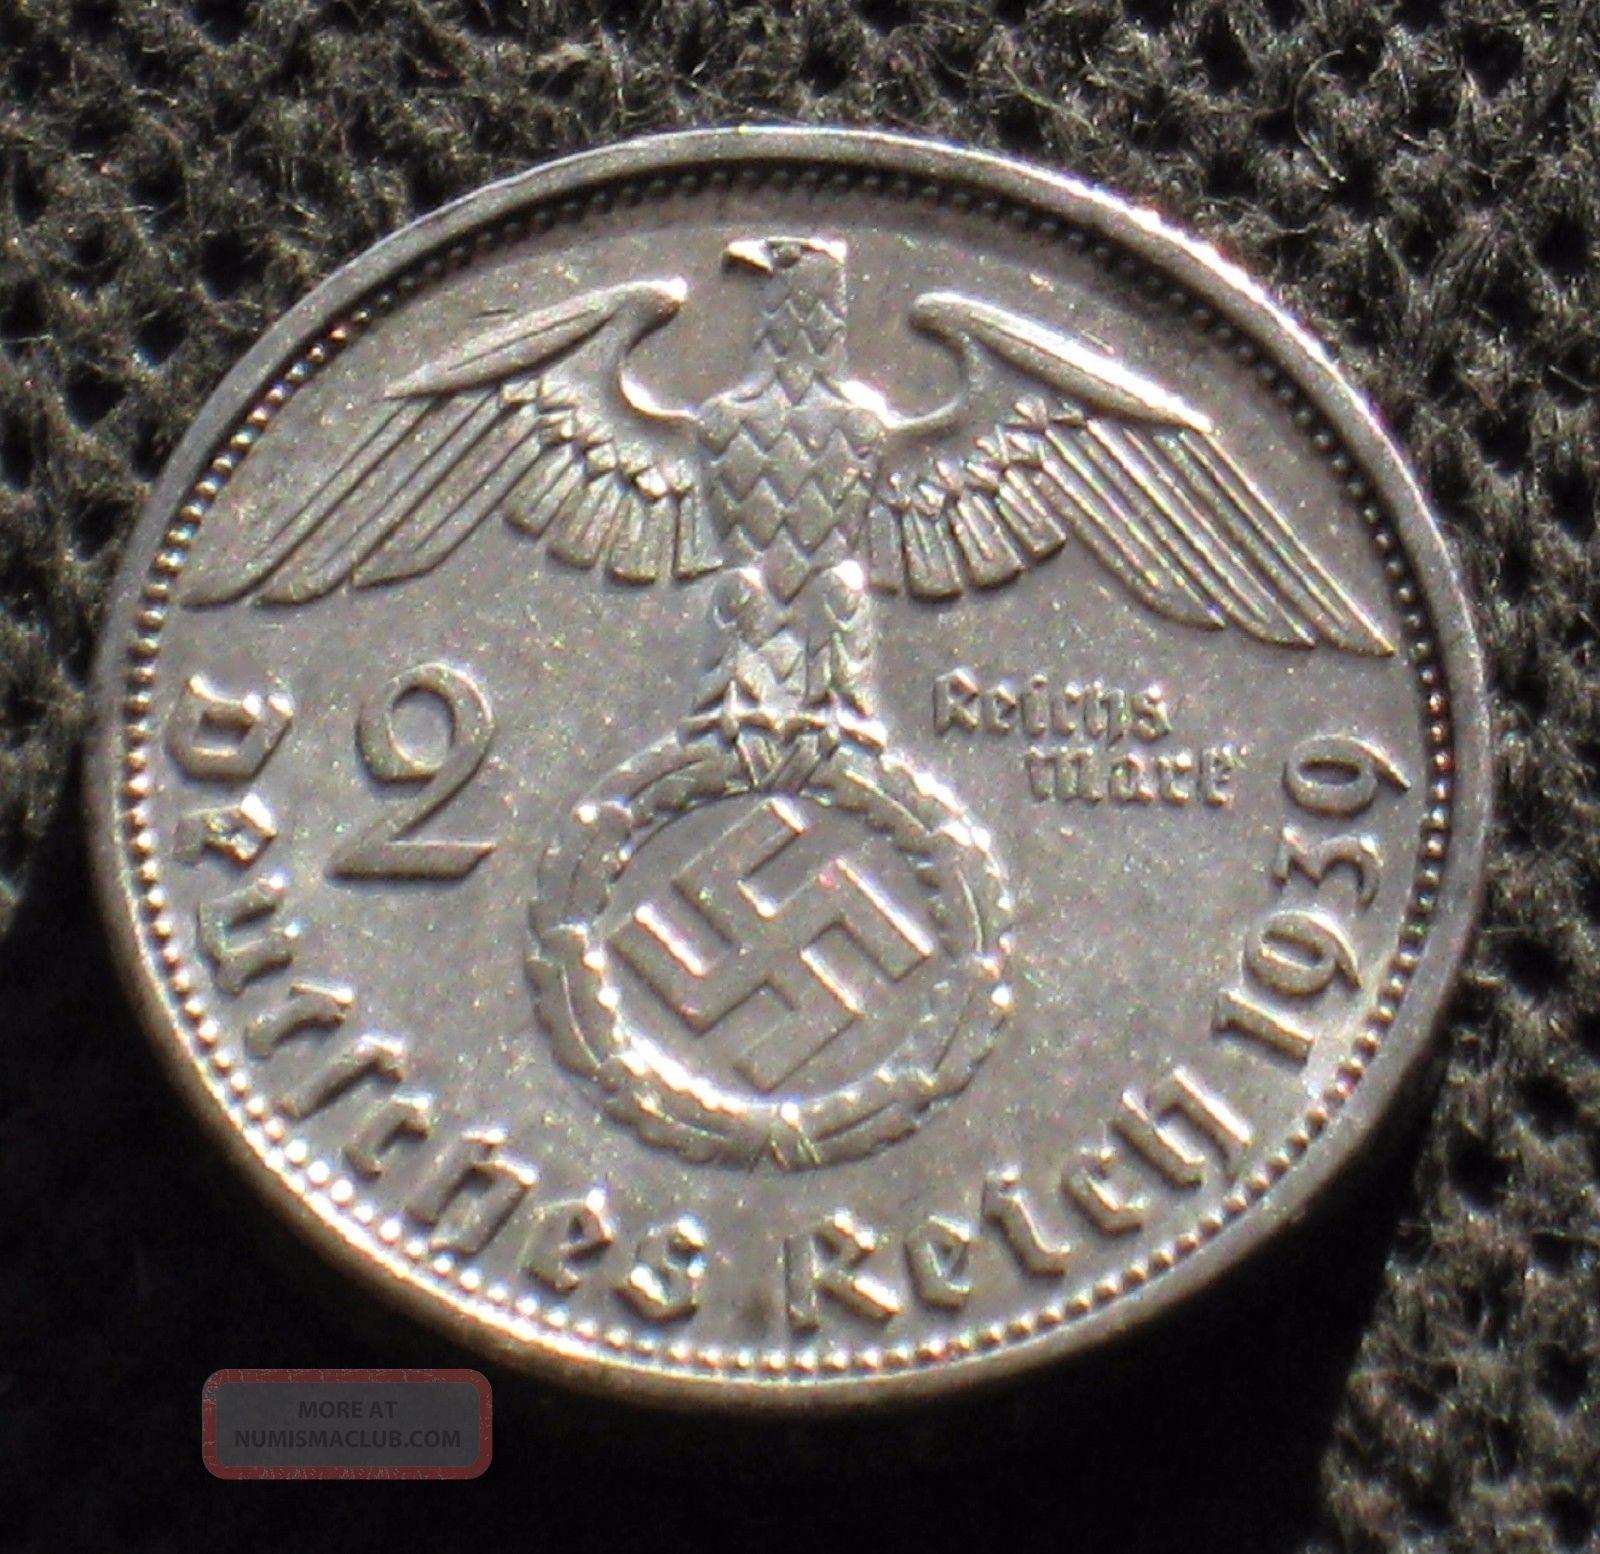 Old Silver 2 Reichsmark Coin Nazi Germany Swastika 1939 A Berlin World War Ii Germany photo